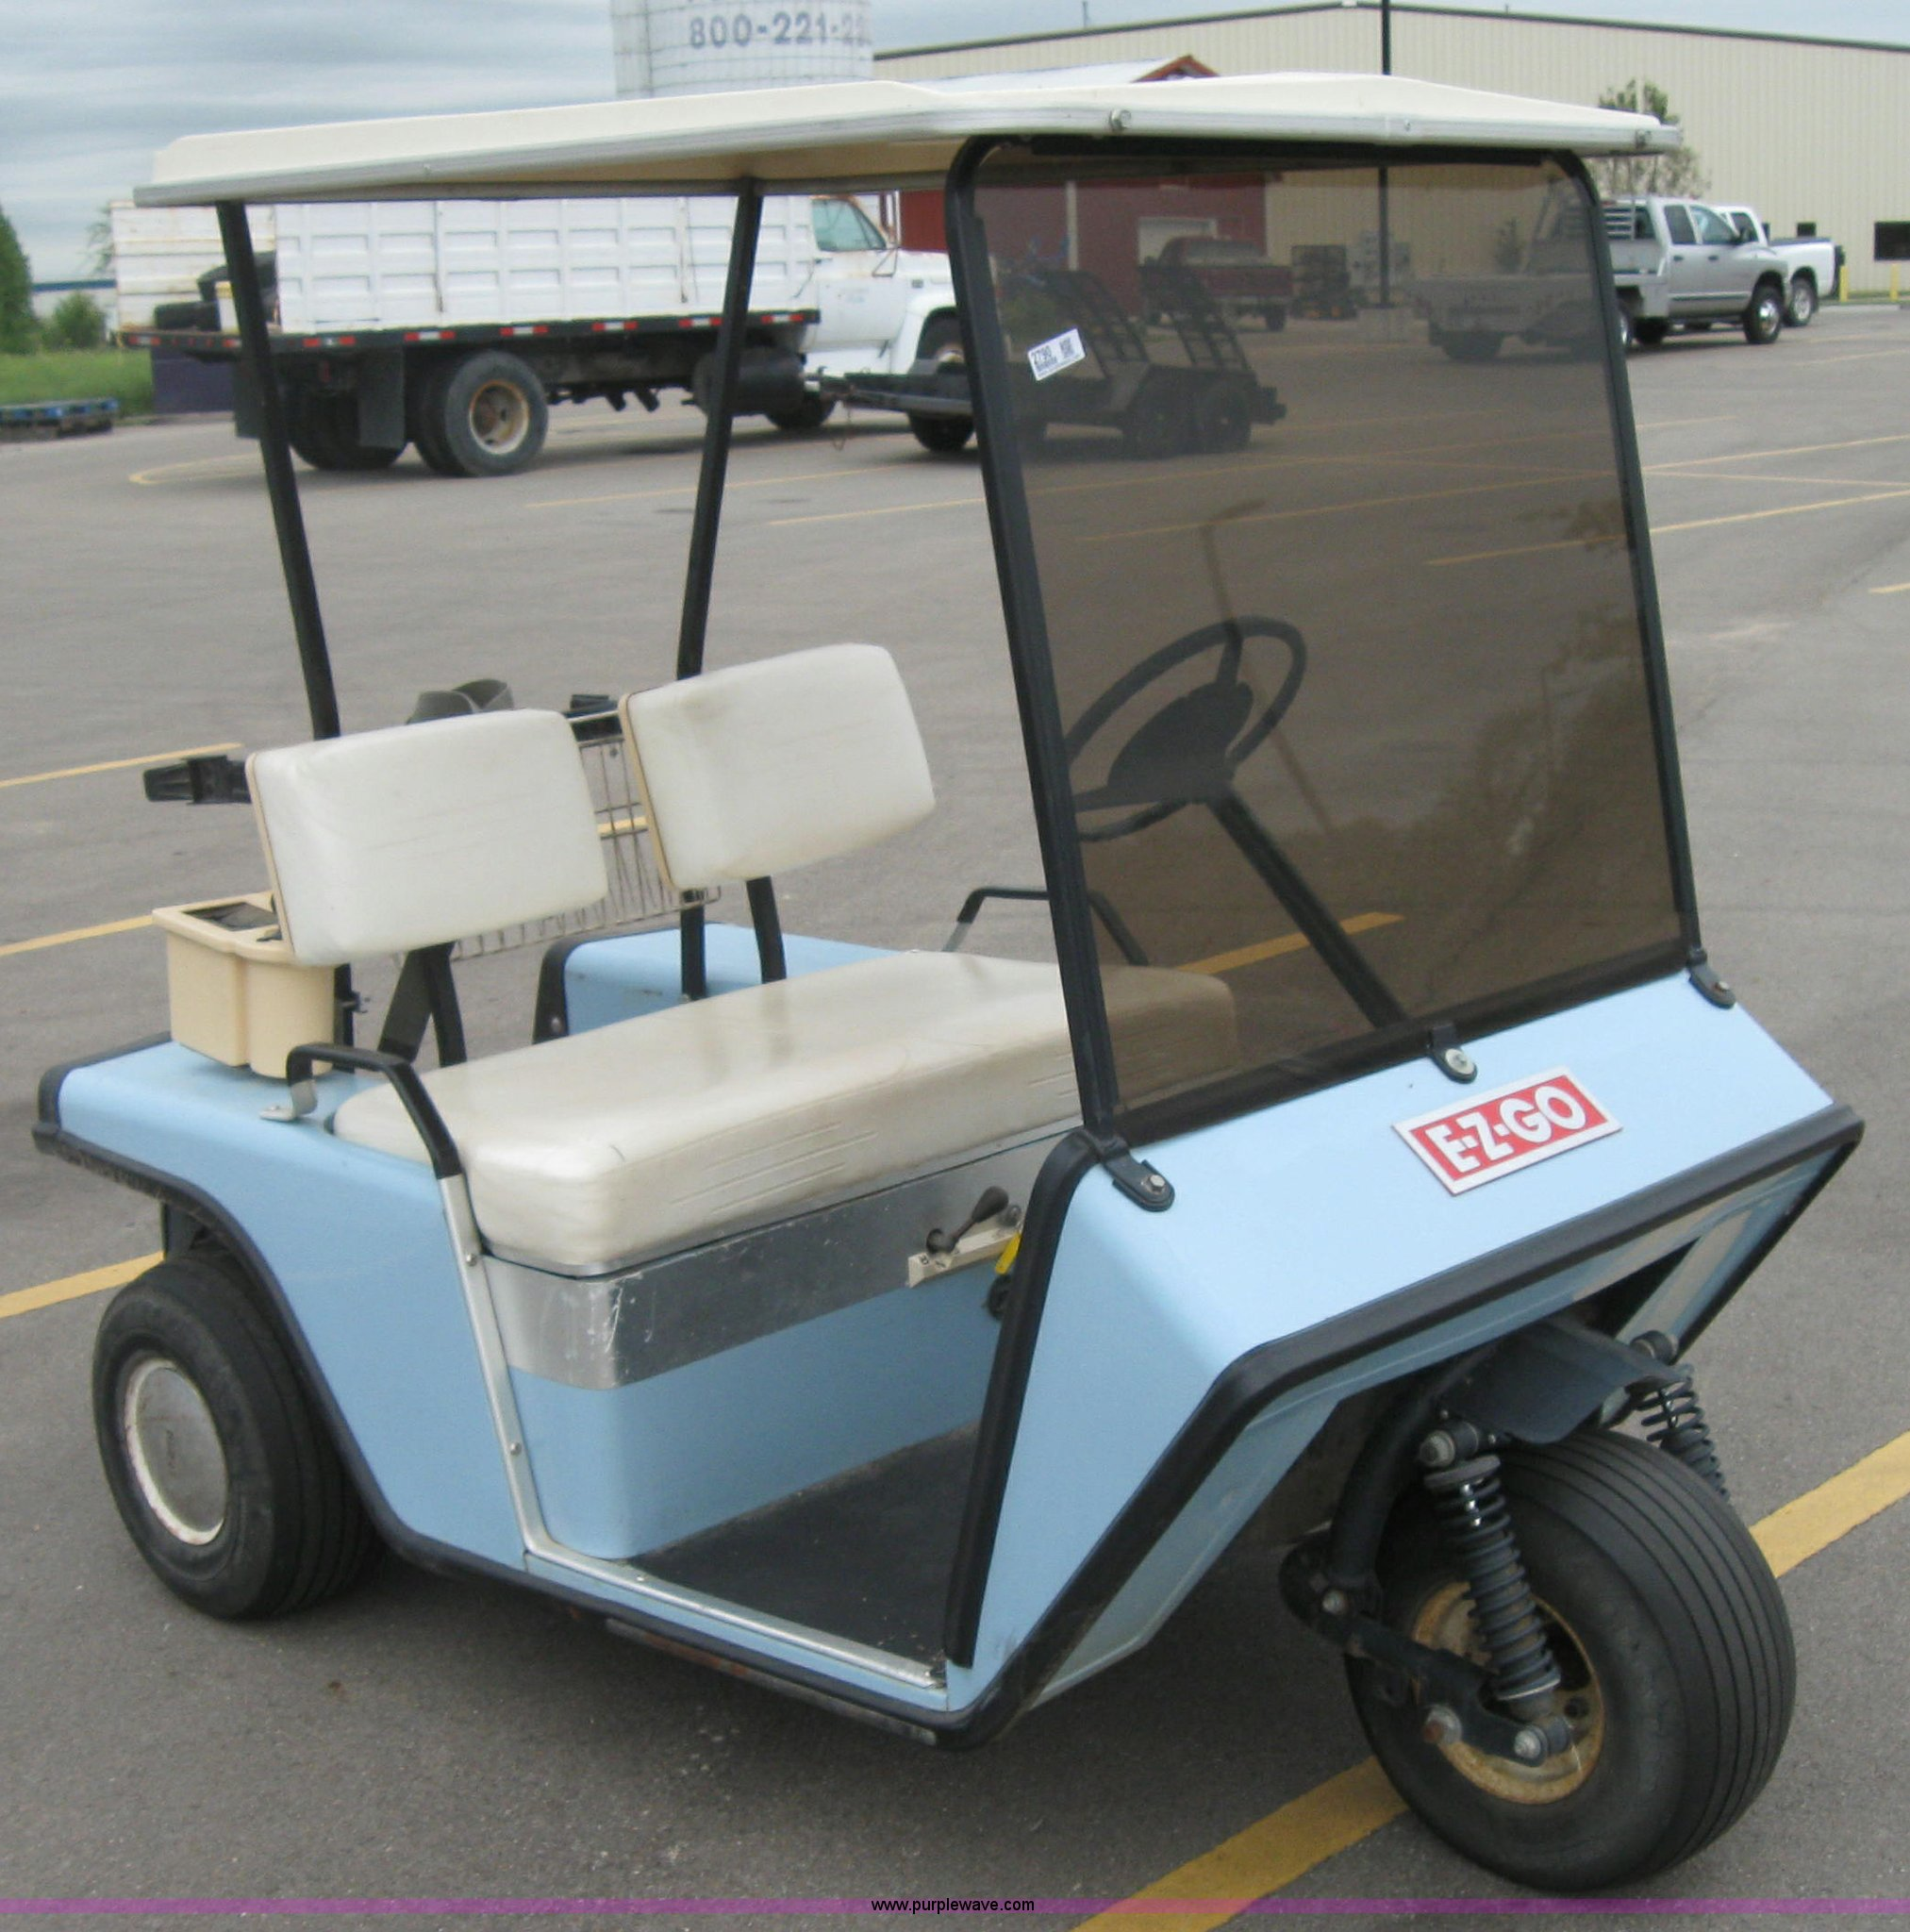 EZ-GO Textron electric golf cart | Item 2790 | SOLD! Septemb... on fox golf carts, carryall golf carts, used golf carts, easy go golf carts, custom golf carts, toro golf carts, gmc golf carts, sears golf carts, nissan golf carts, mitsubishi golf carts, electric golf carts, isuzu golf carts, arctic cat golf carts, 2015 golf carts, yamaha golf carts, john deere golf carts, cool golf carts, jacobsen golf carts, suzuki golf carts, club car golf carts,